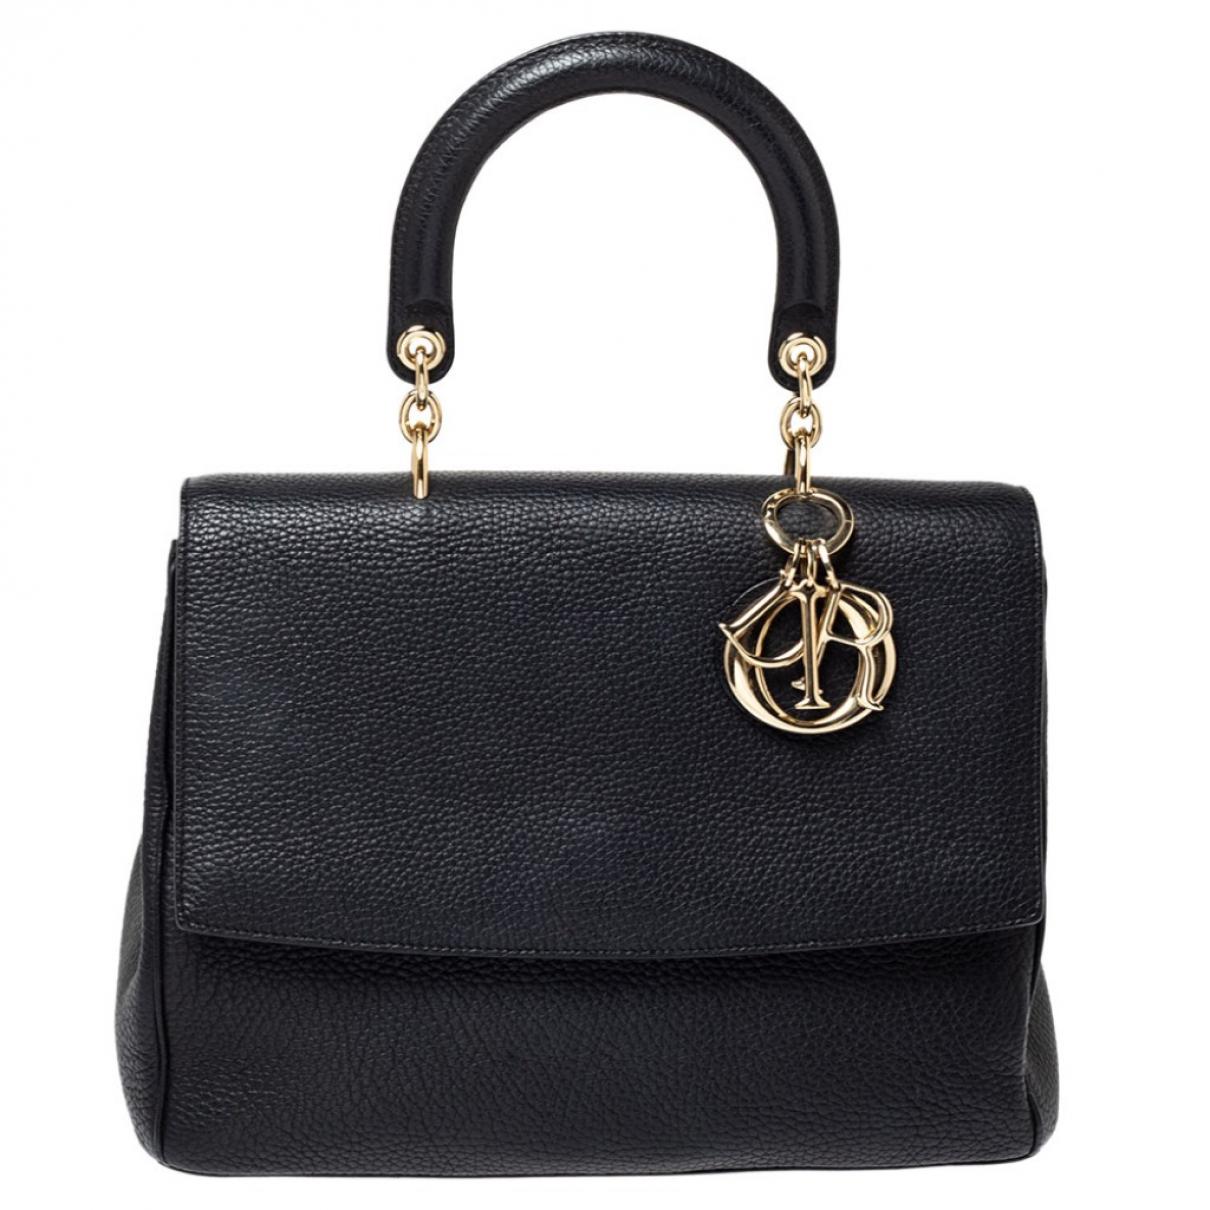 Dior Be Dior Black Leather handbag for Women N